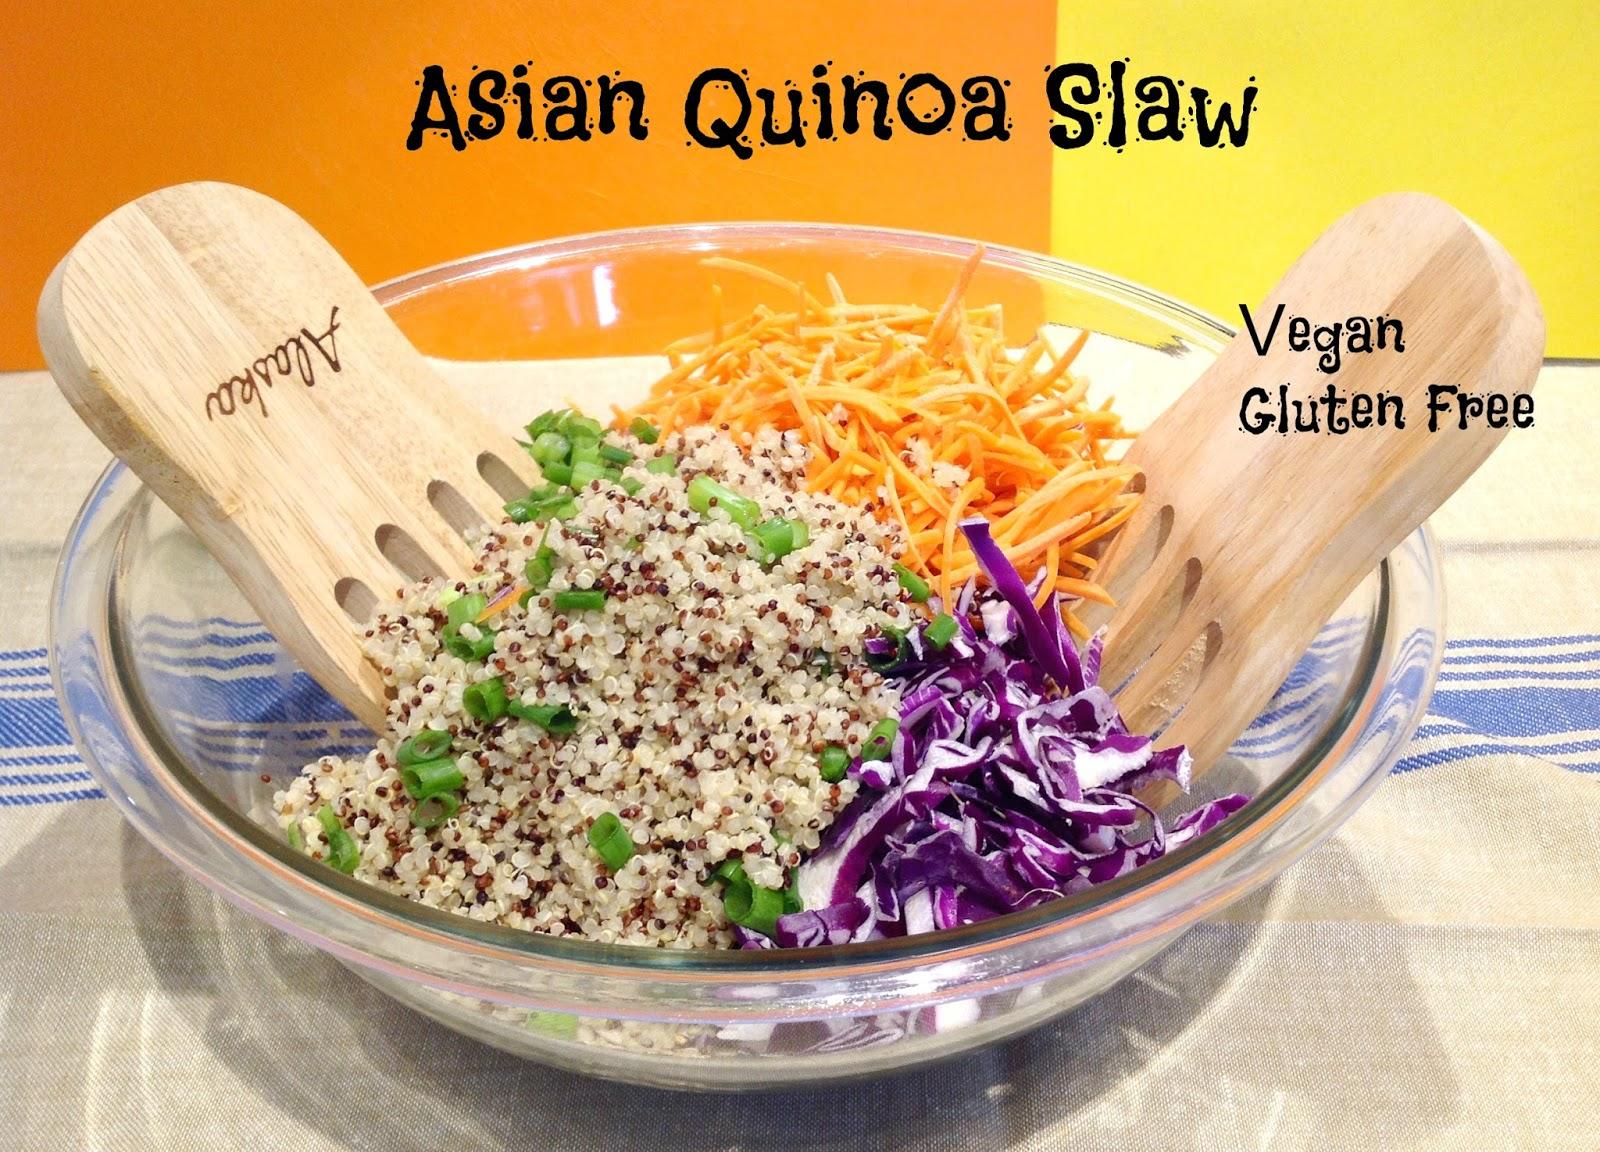 Gluten Free A-Z Asian Quinoa Slaw Salad